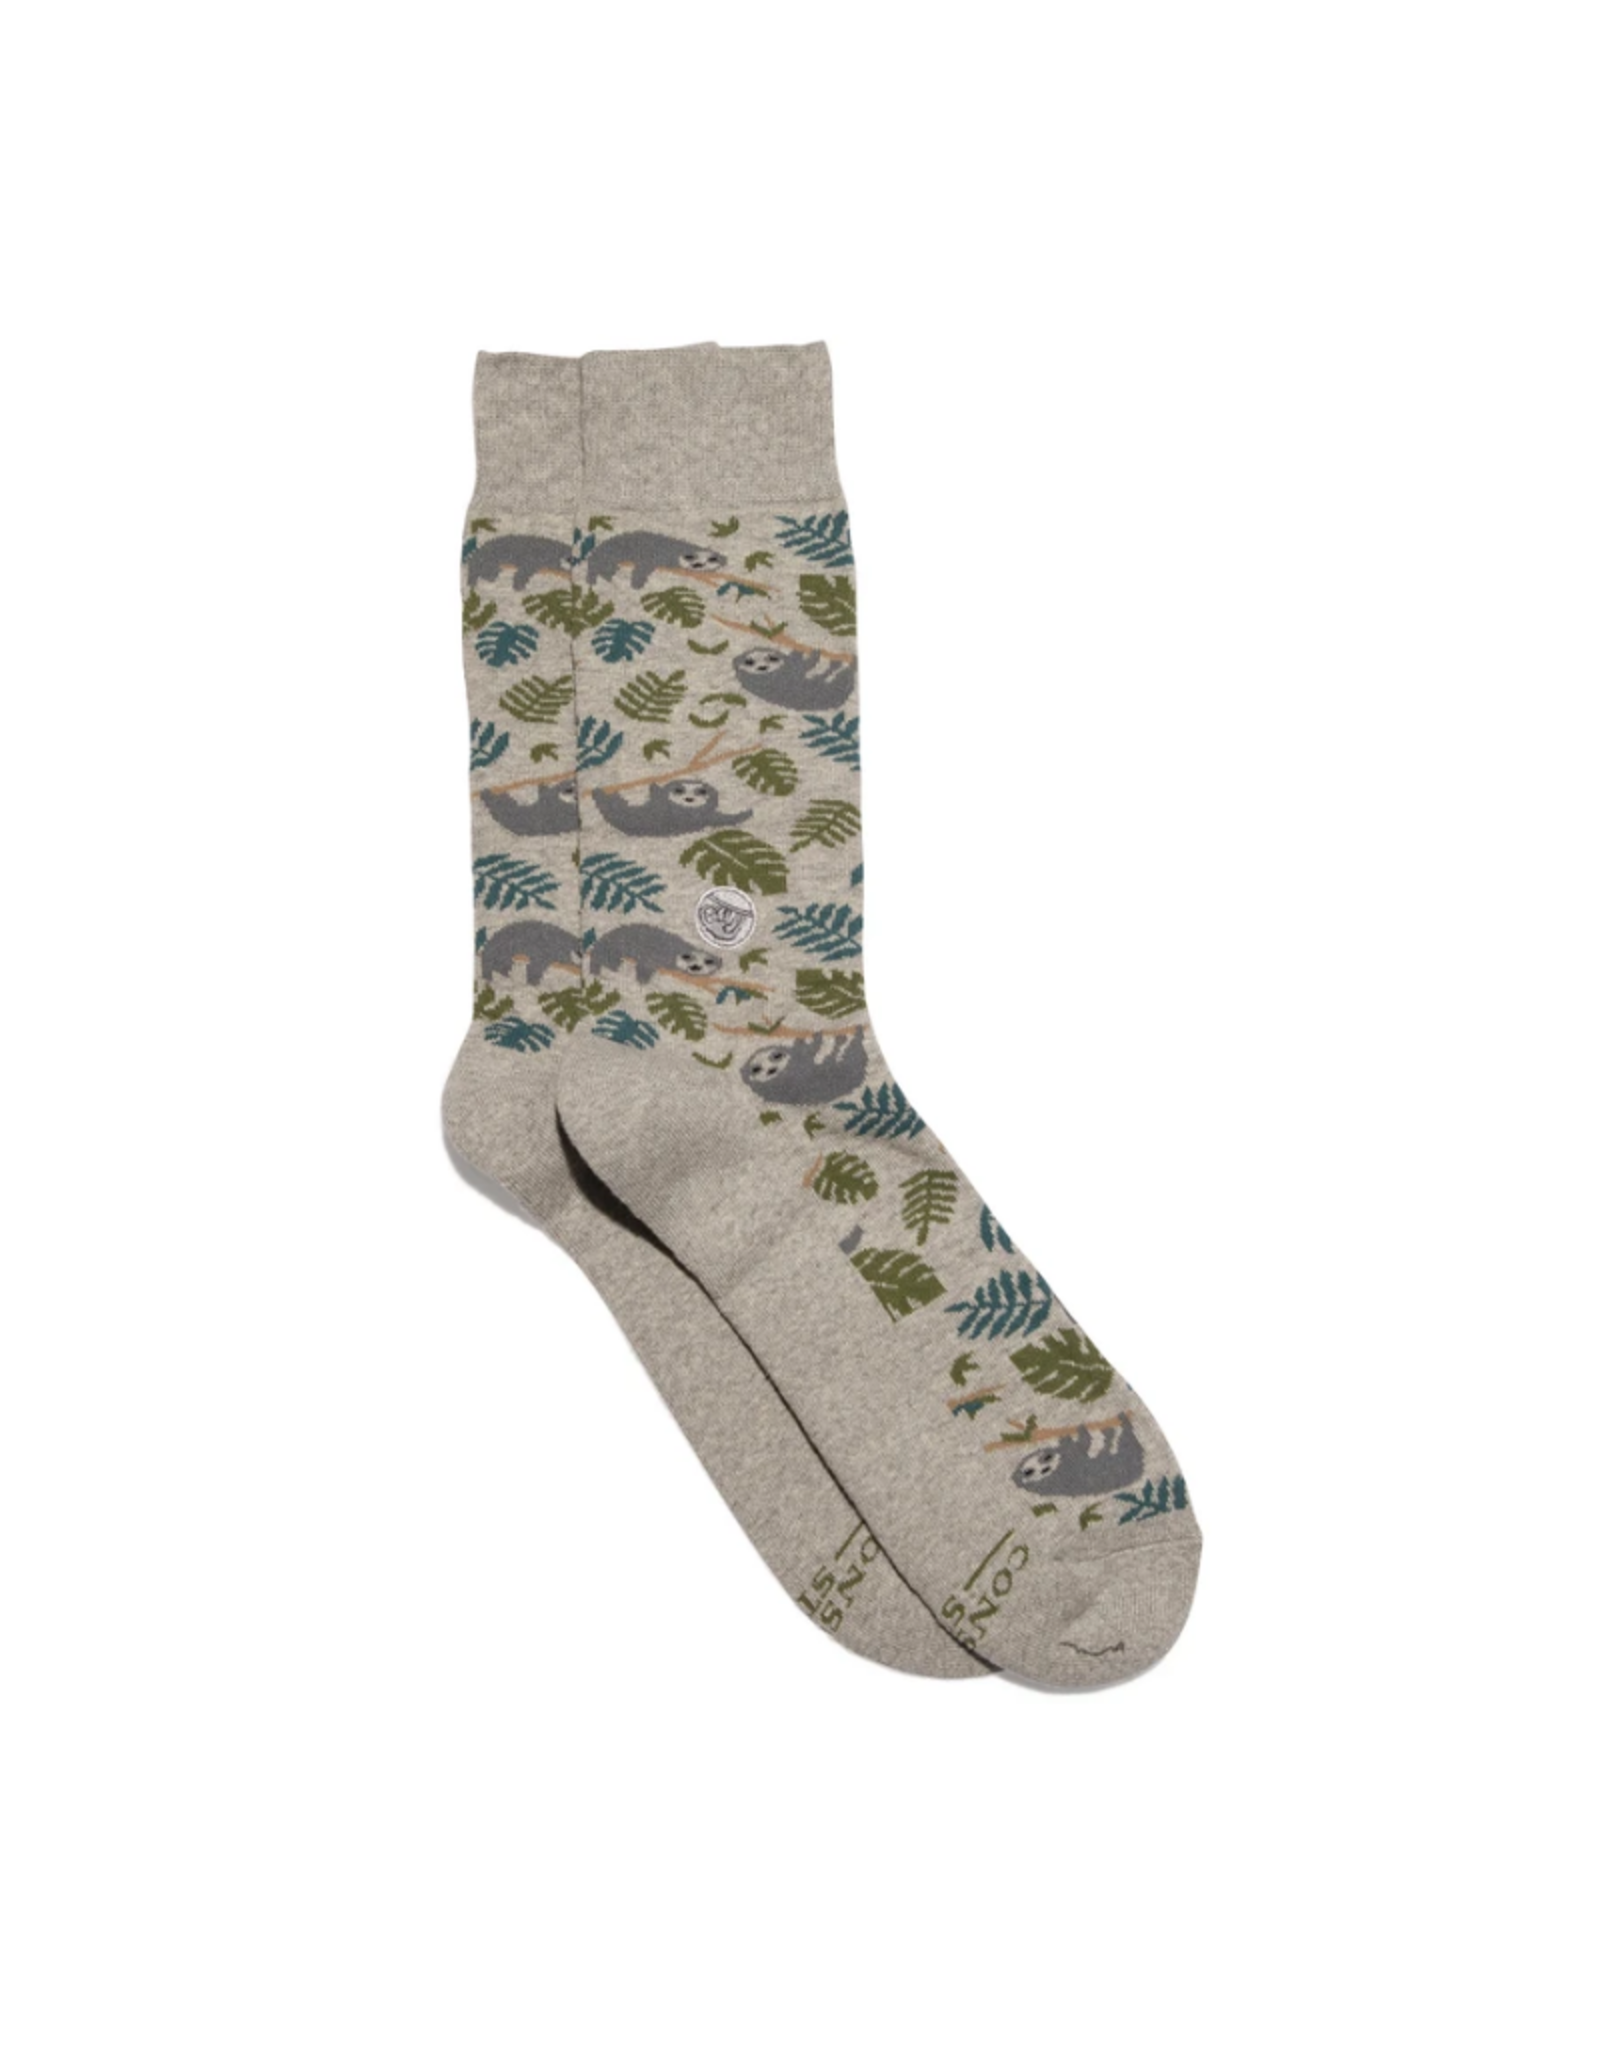 Conscious Step Socks that Protect Sloths (Medium)